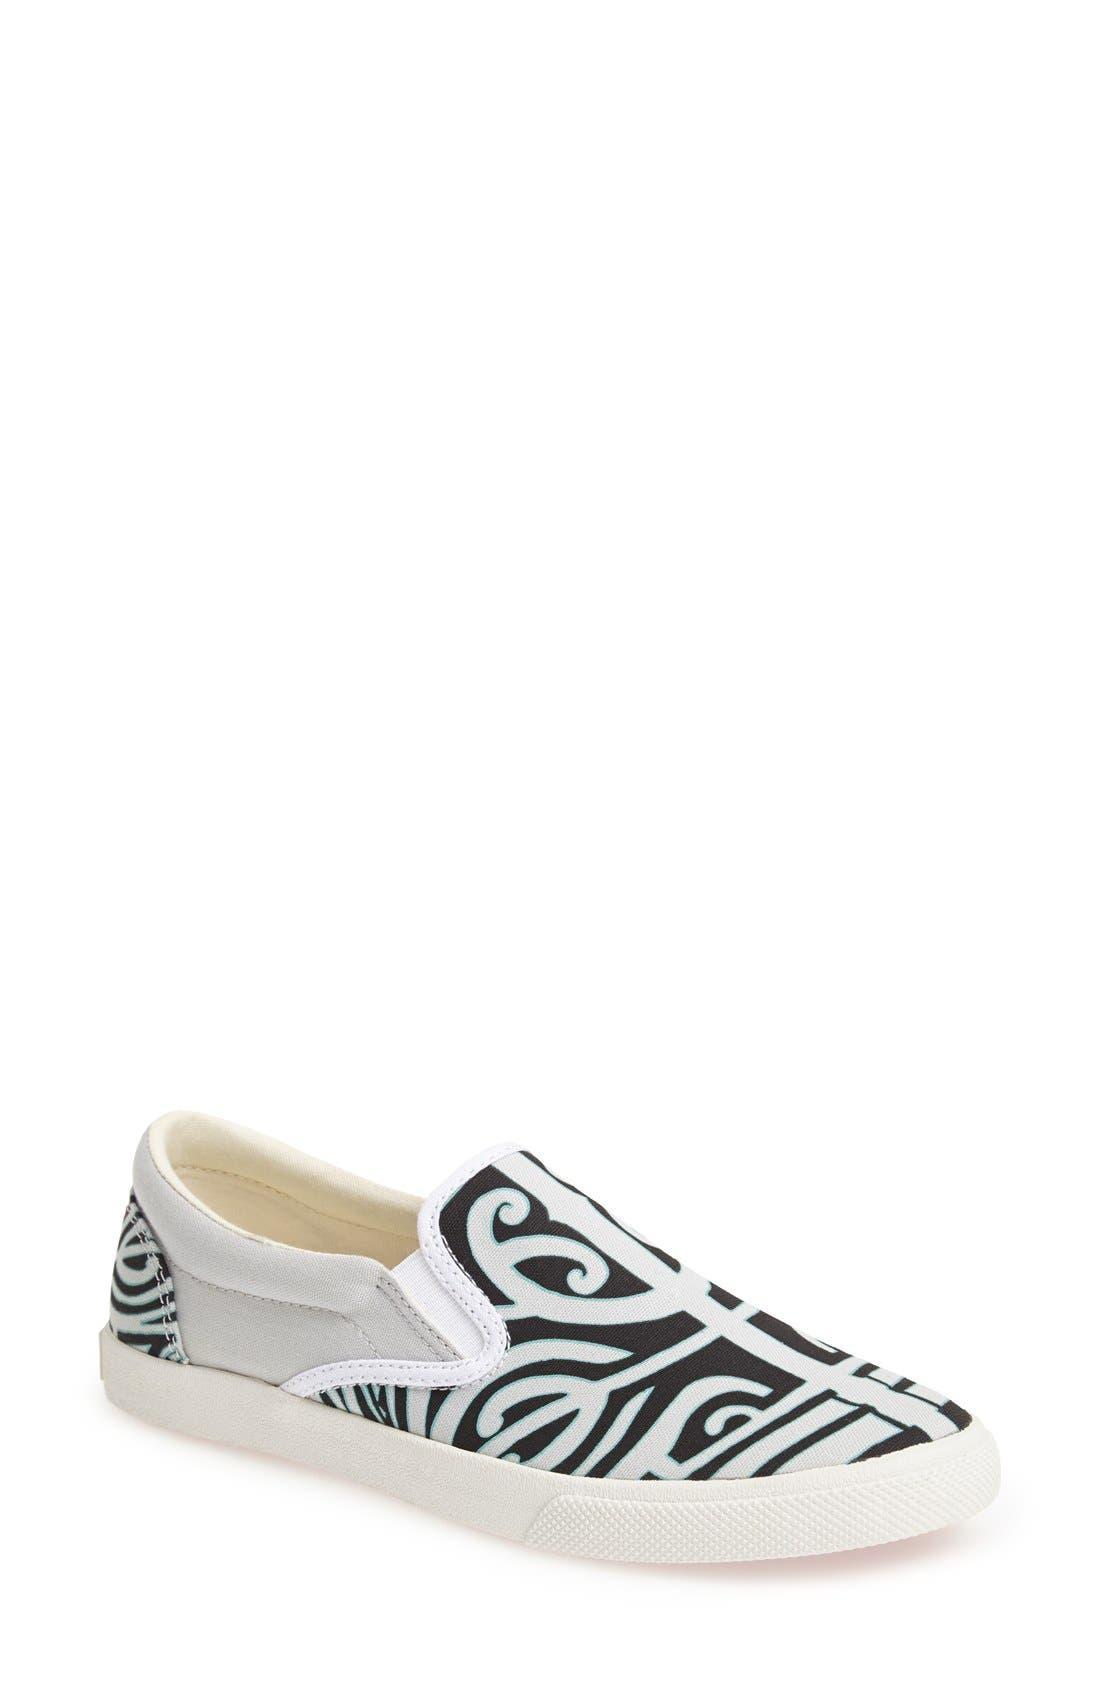 Alternate Image 1 Selected - BucketFeet 'Tatau' Slip-On Canvas Sneaker (Women)